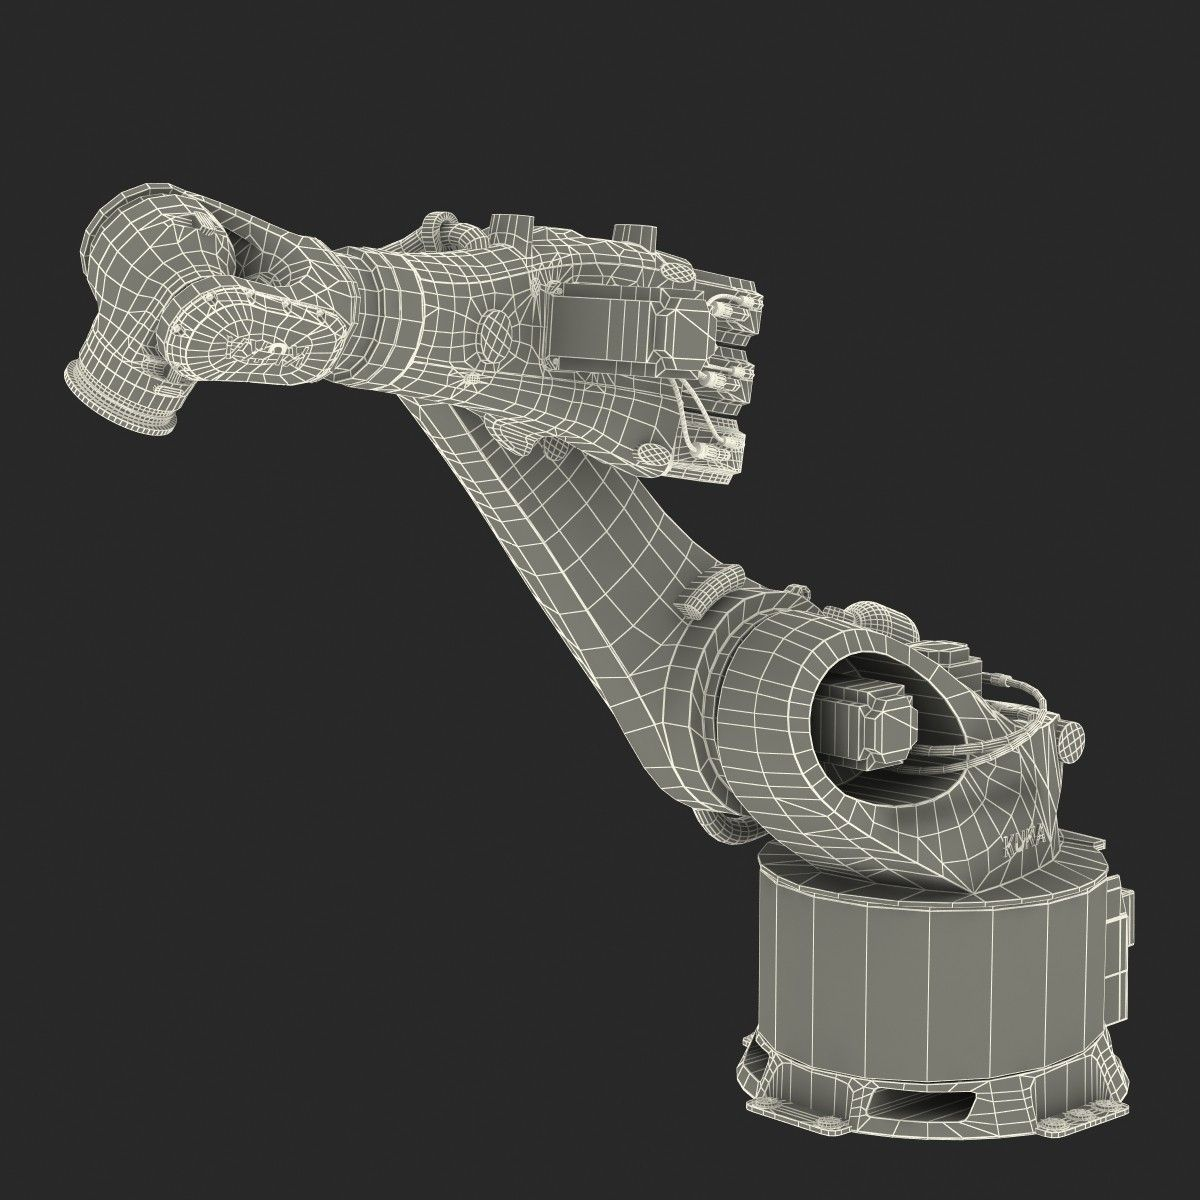 3d kuka robot kr 360 model | AGV in 2019 | Robot, Robot arm